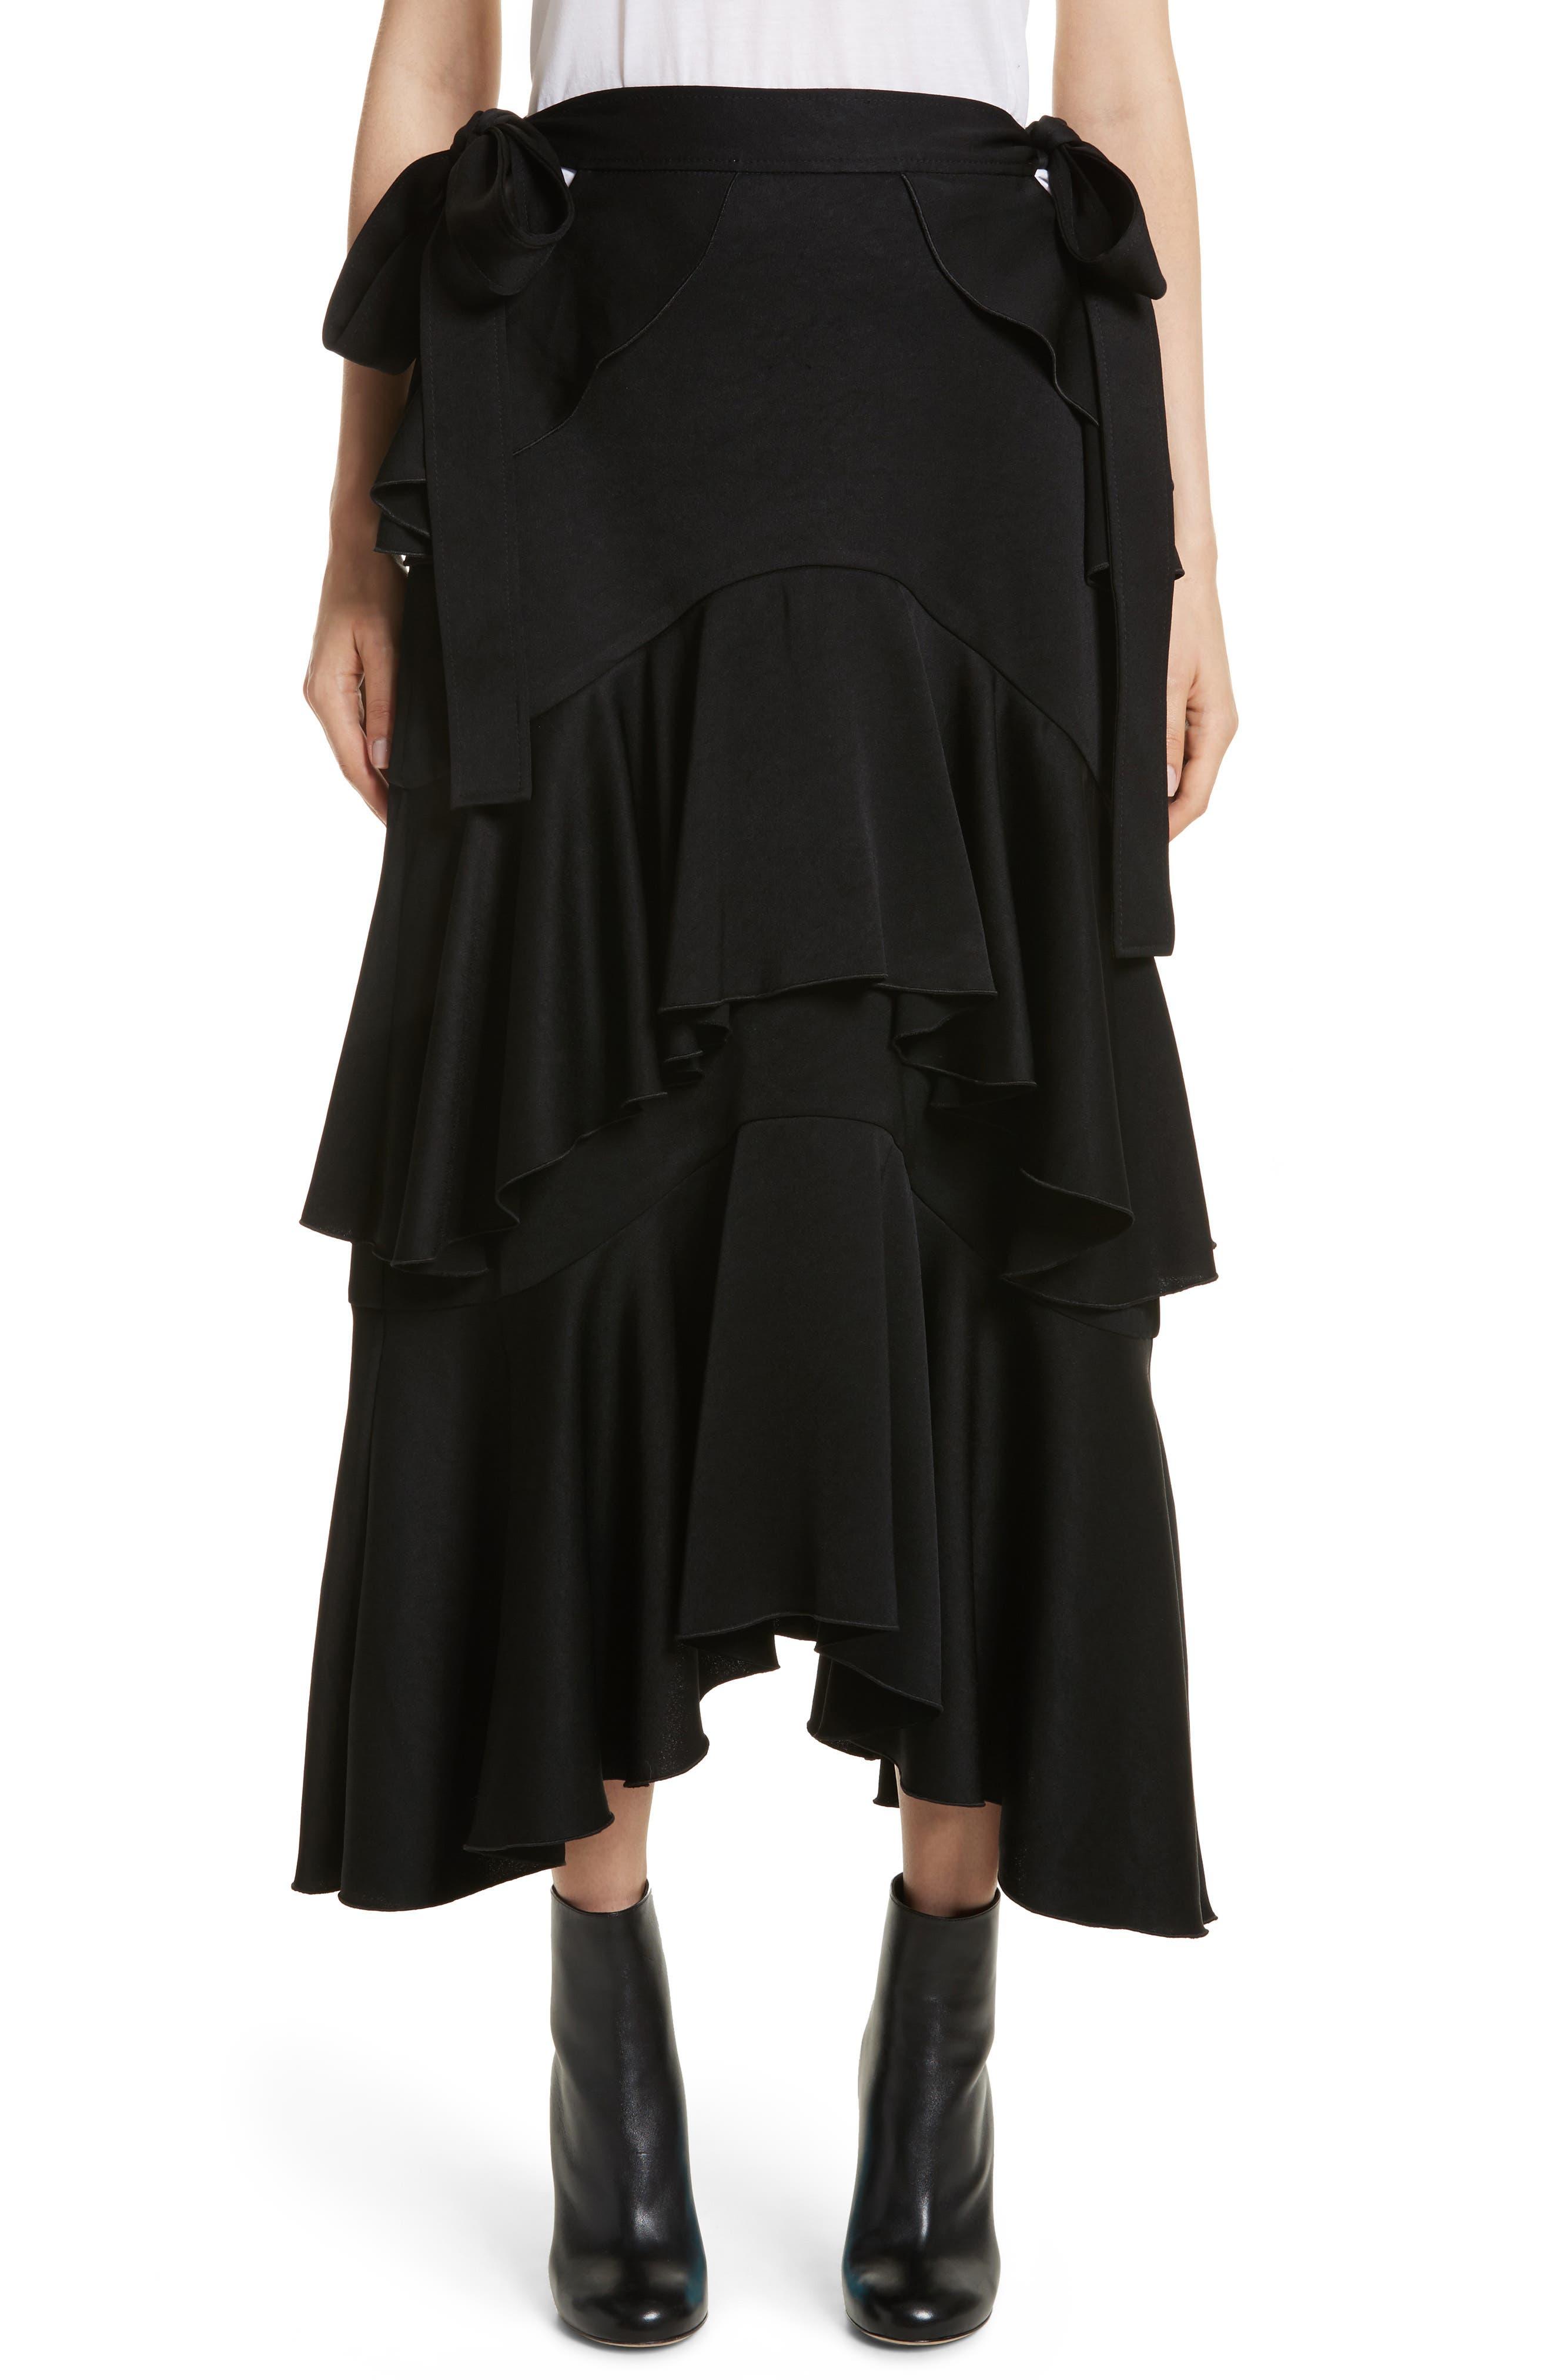 Saloon Ruffle Skirt,                             Main thumbnail 1, color,                             001